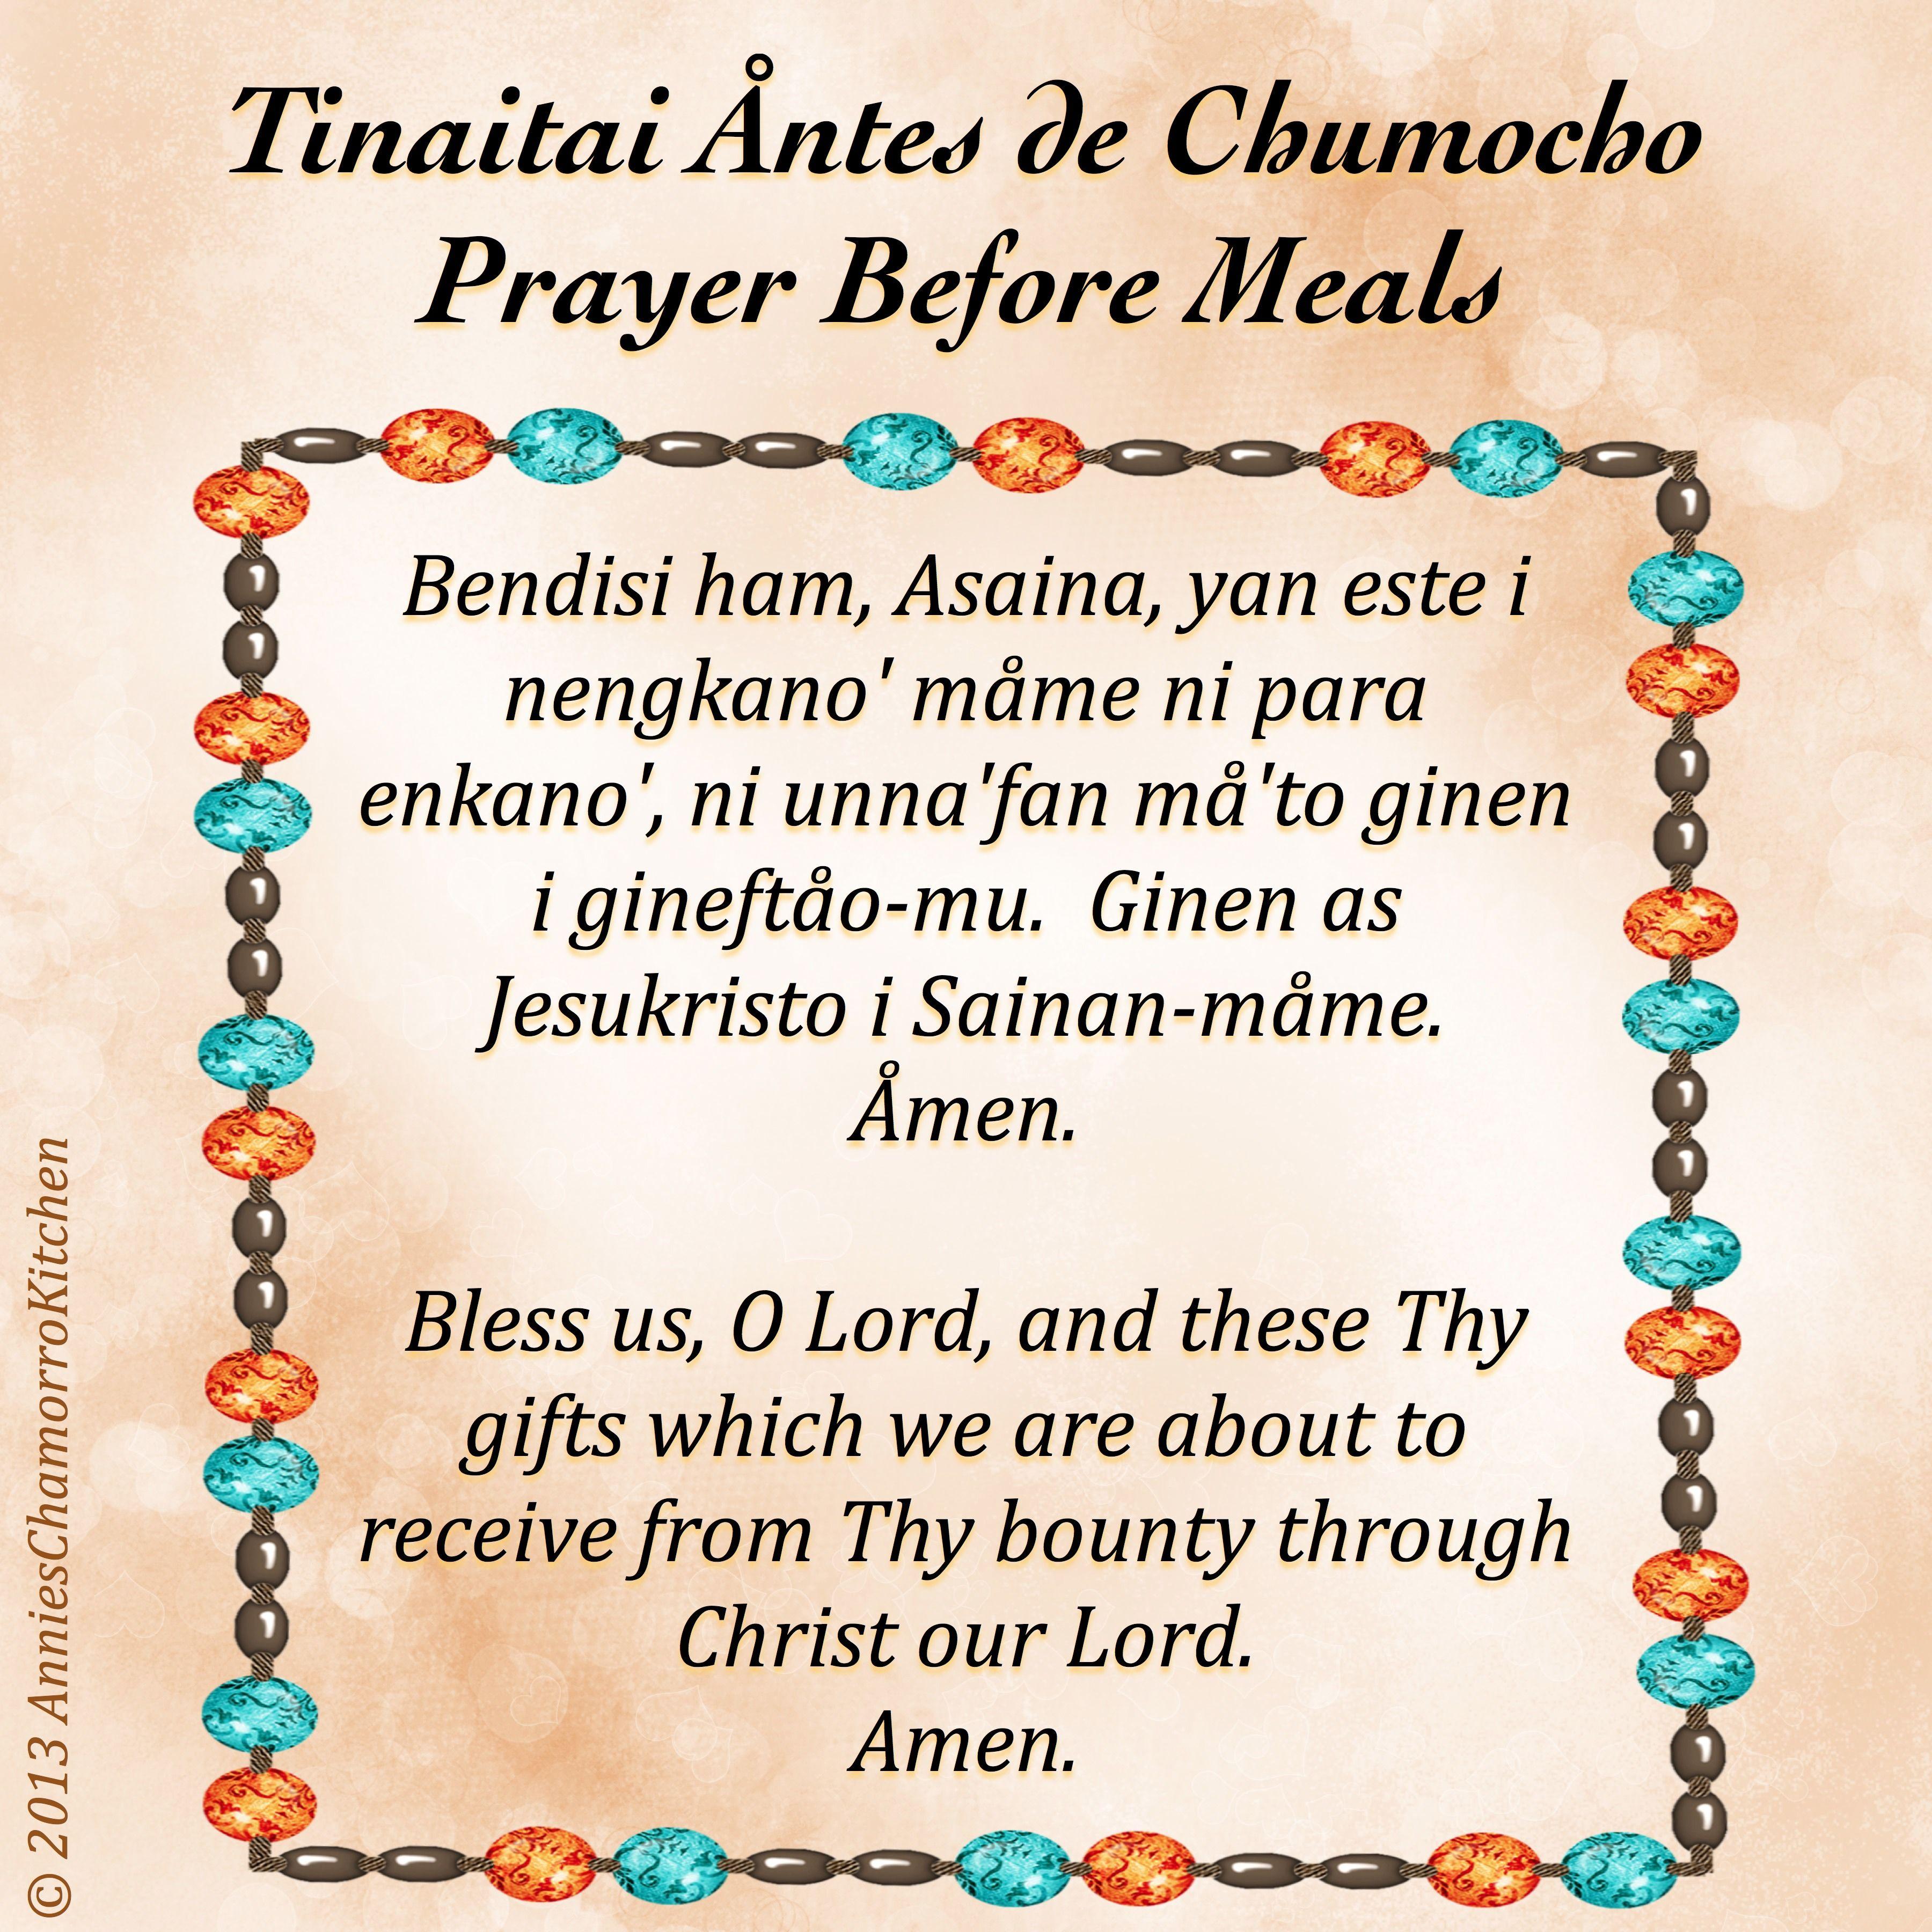 Prayer Before Meals ~ Tinaitai Åntes De Chumocho